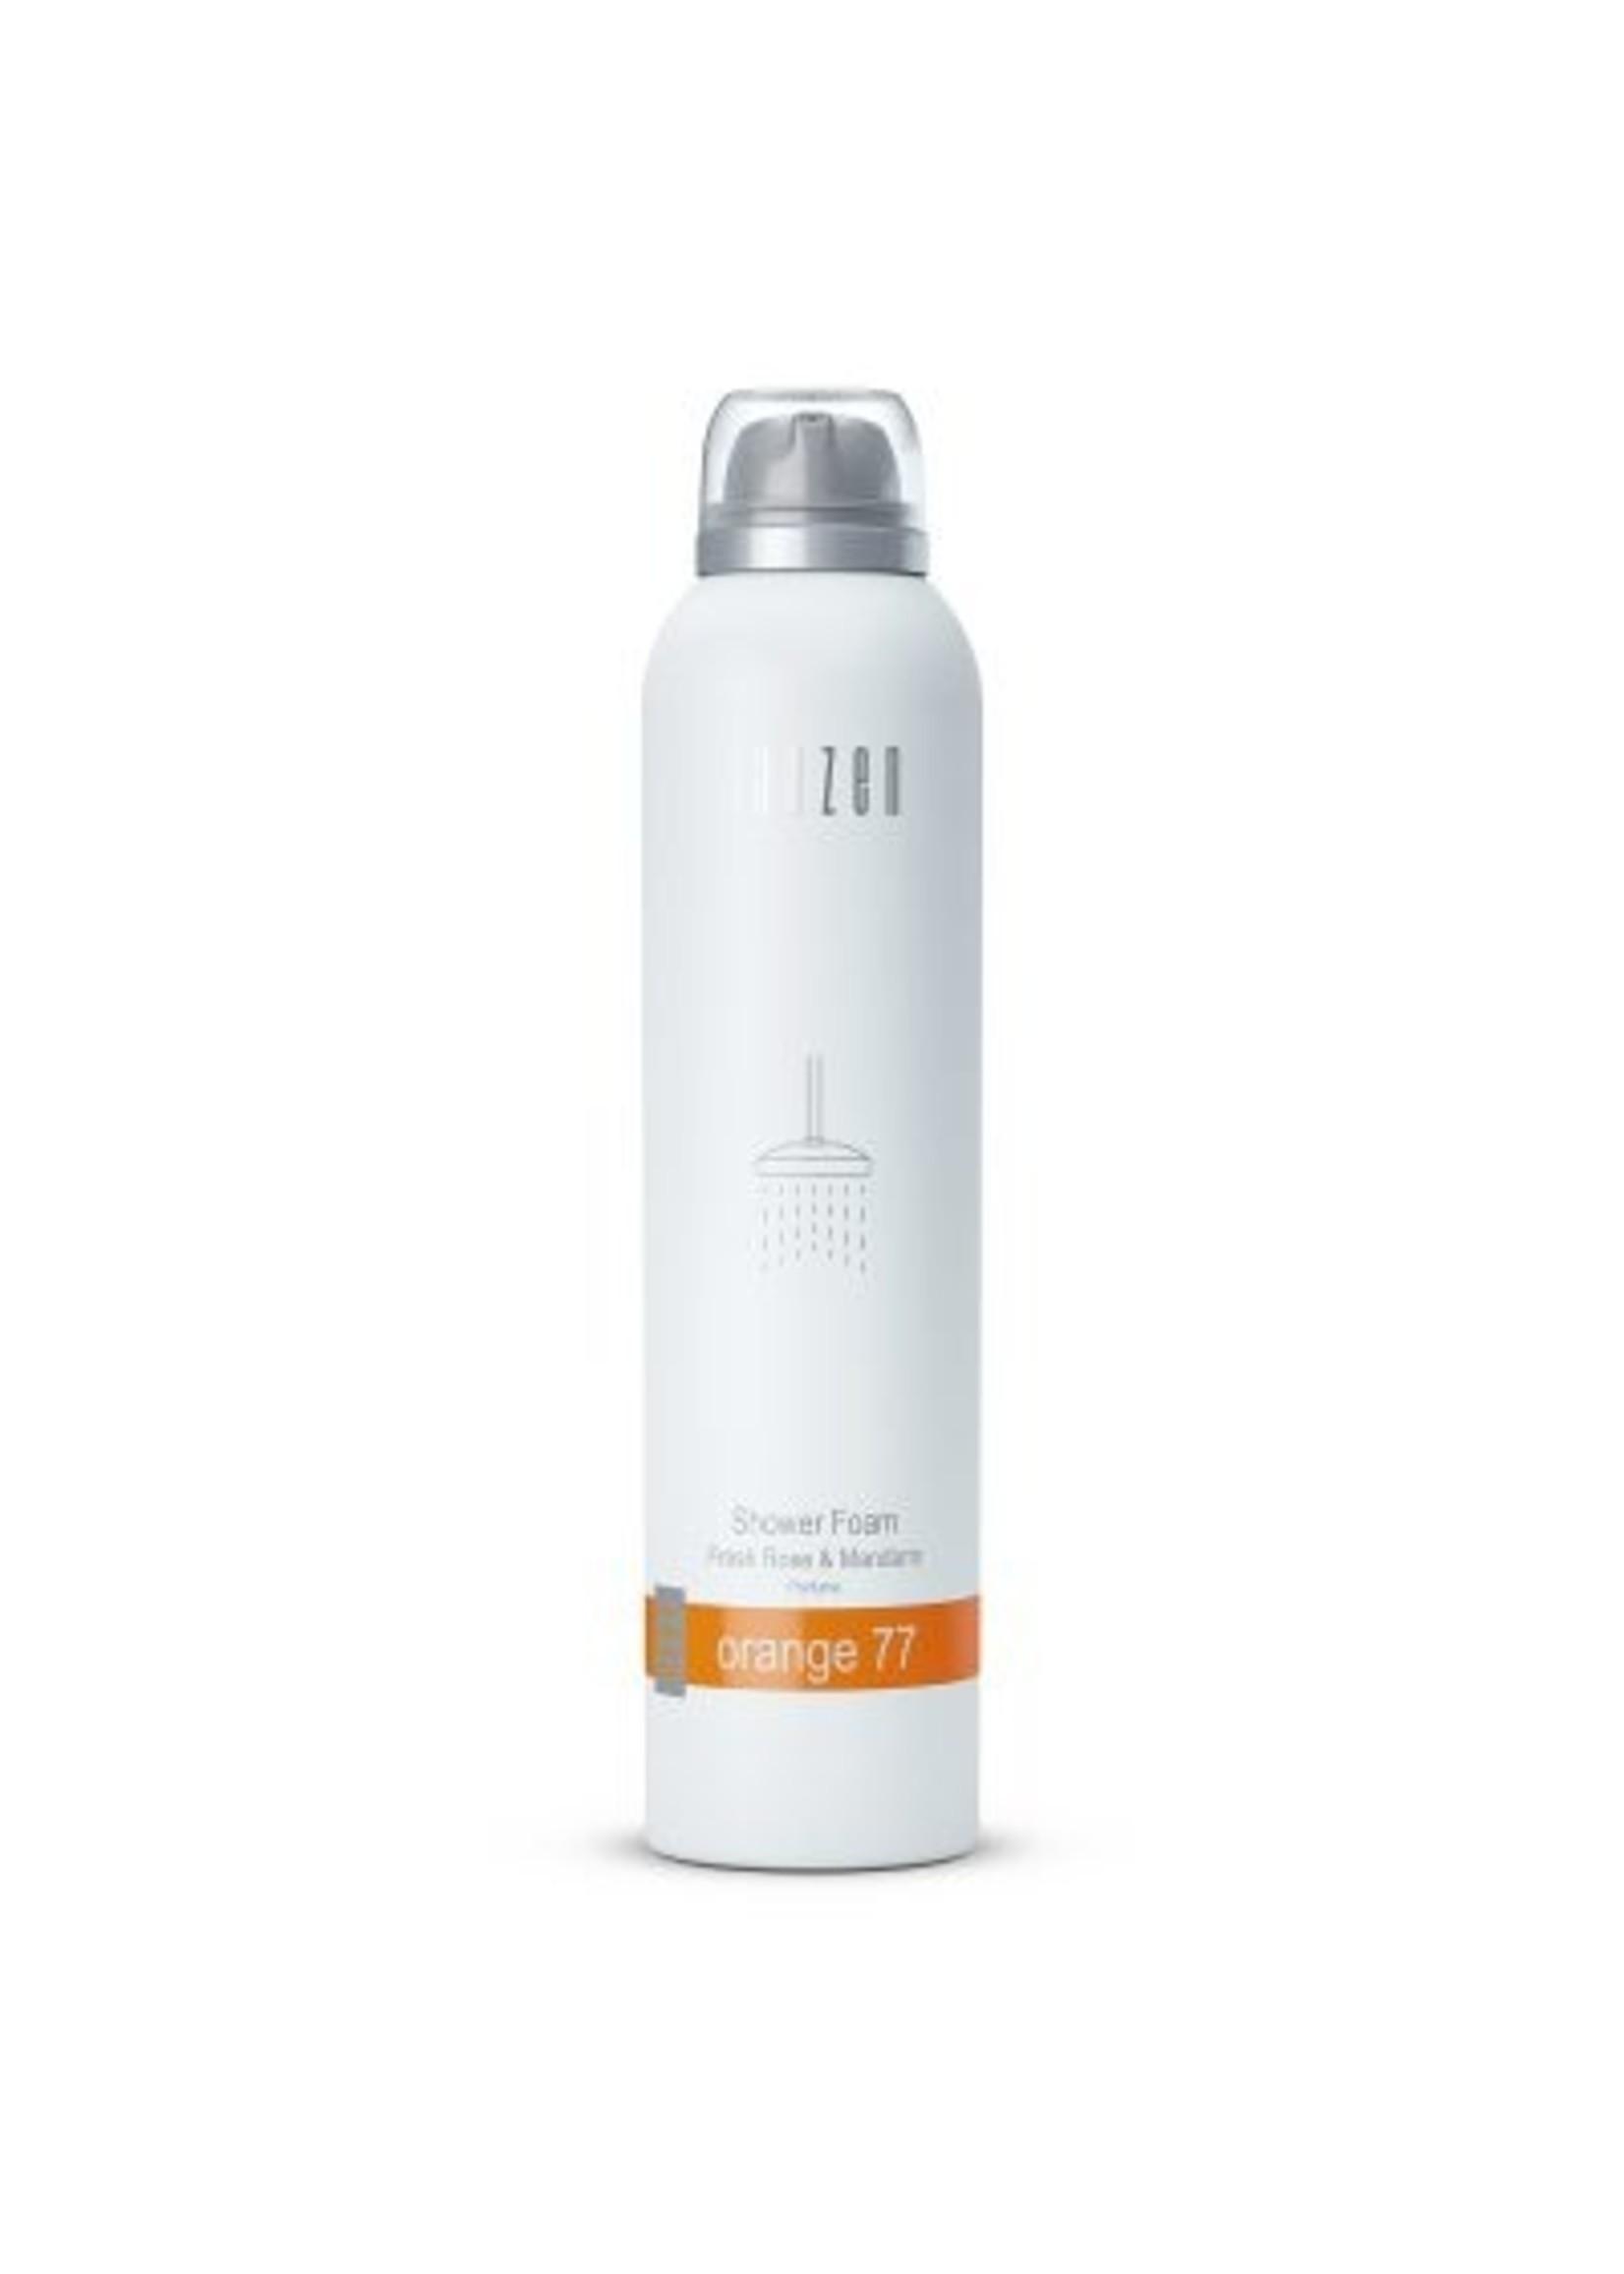 Janzen JANZEN Shower Foam Orange 77